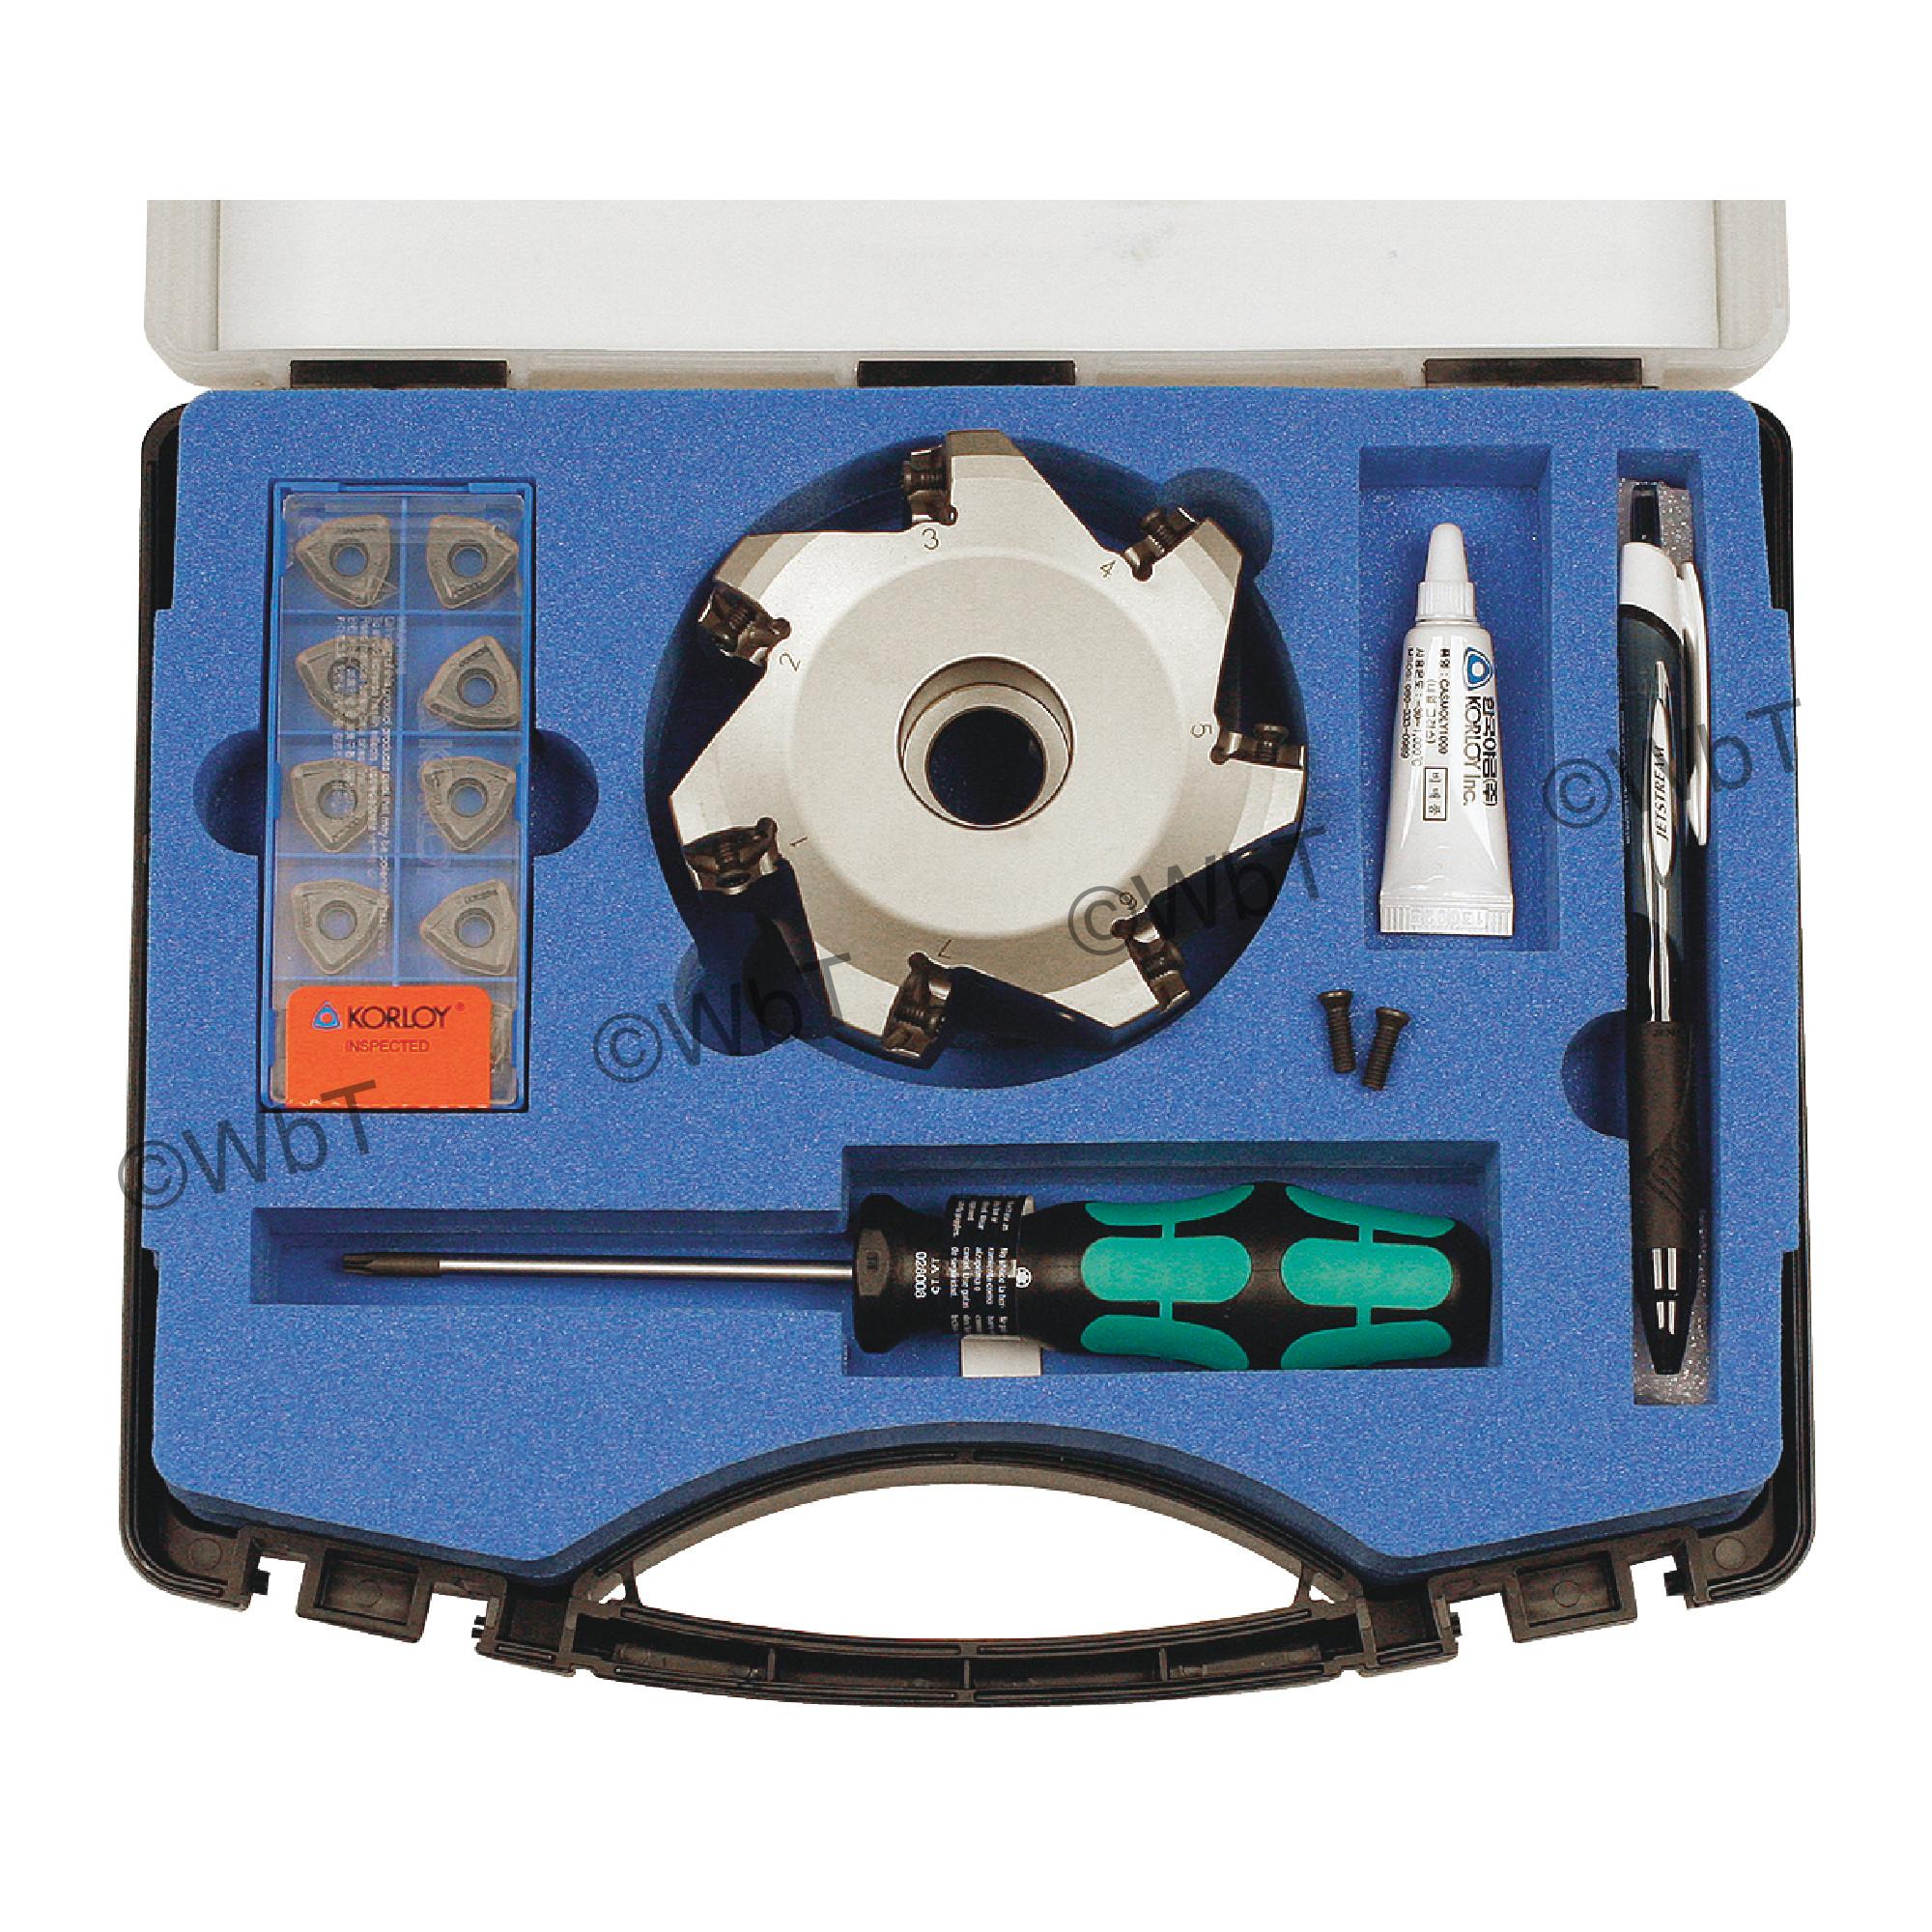 "KORLOY - 4.000"" High-Feed Face Mill Set / Includes: (1) HRMDCA13400HR-7 (4.0"" ø) & (10) WNMX130520ZNN-MM PC5300 C"